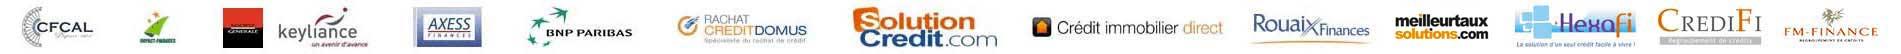 credit_logo